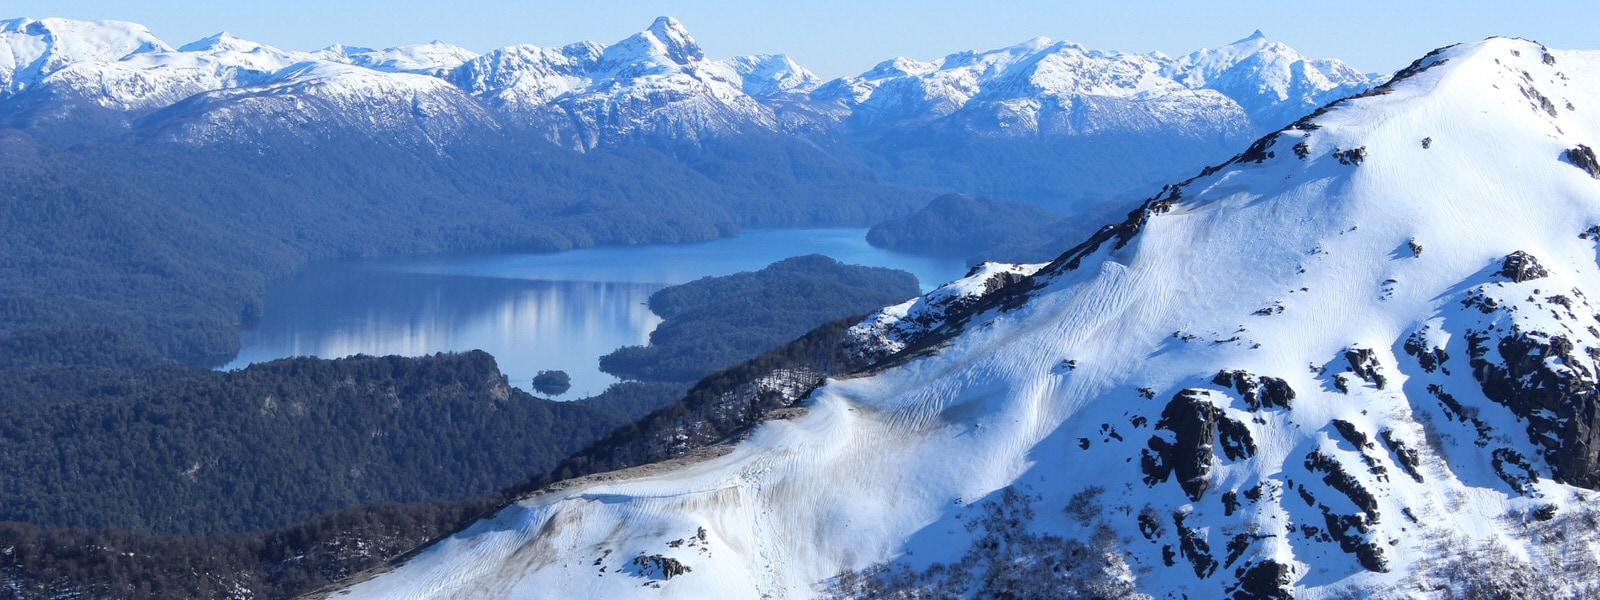 argentina ski progression